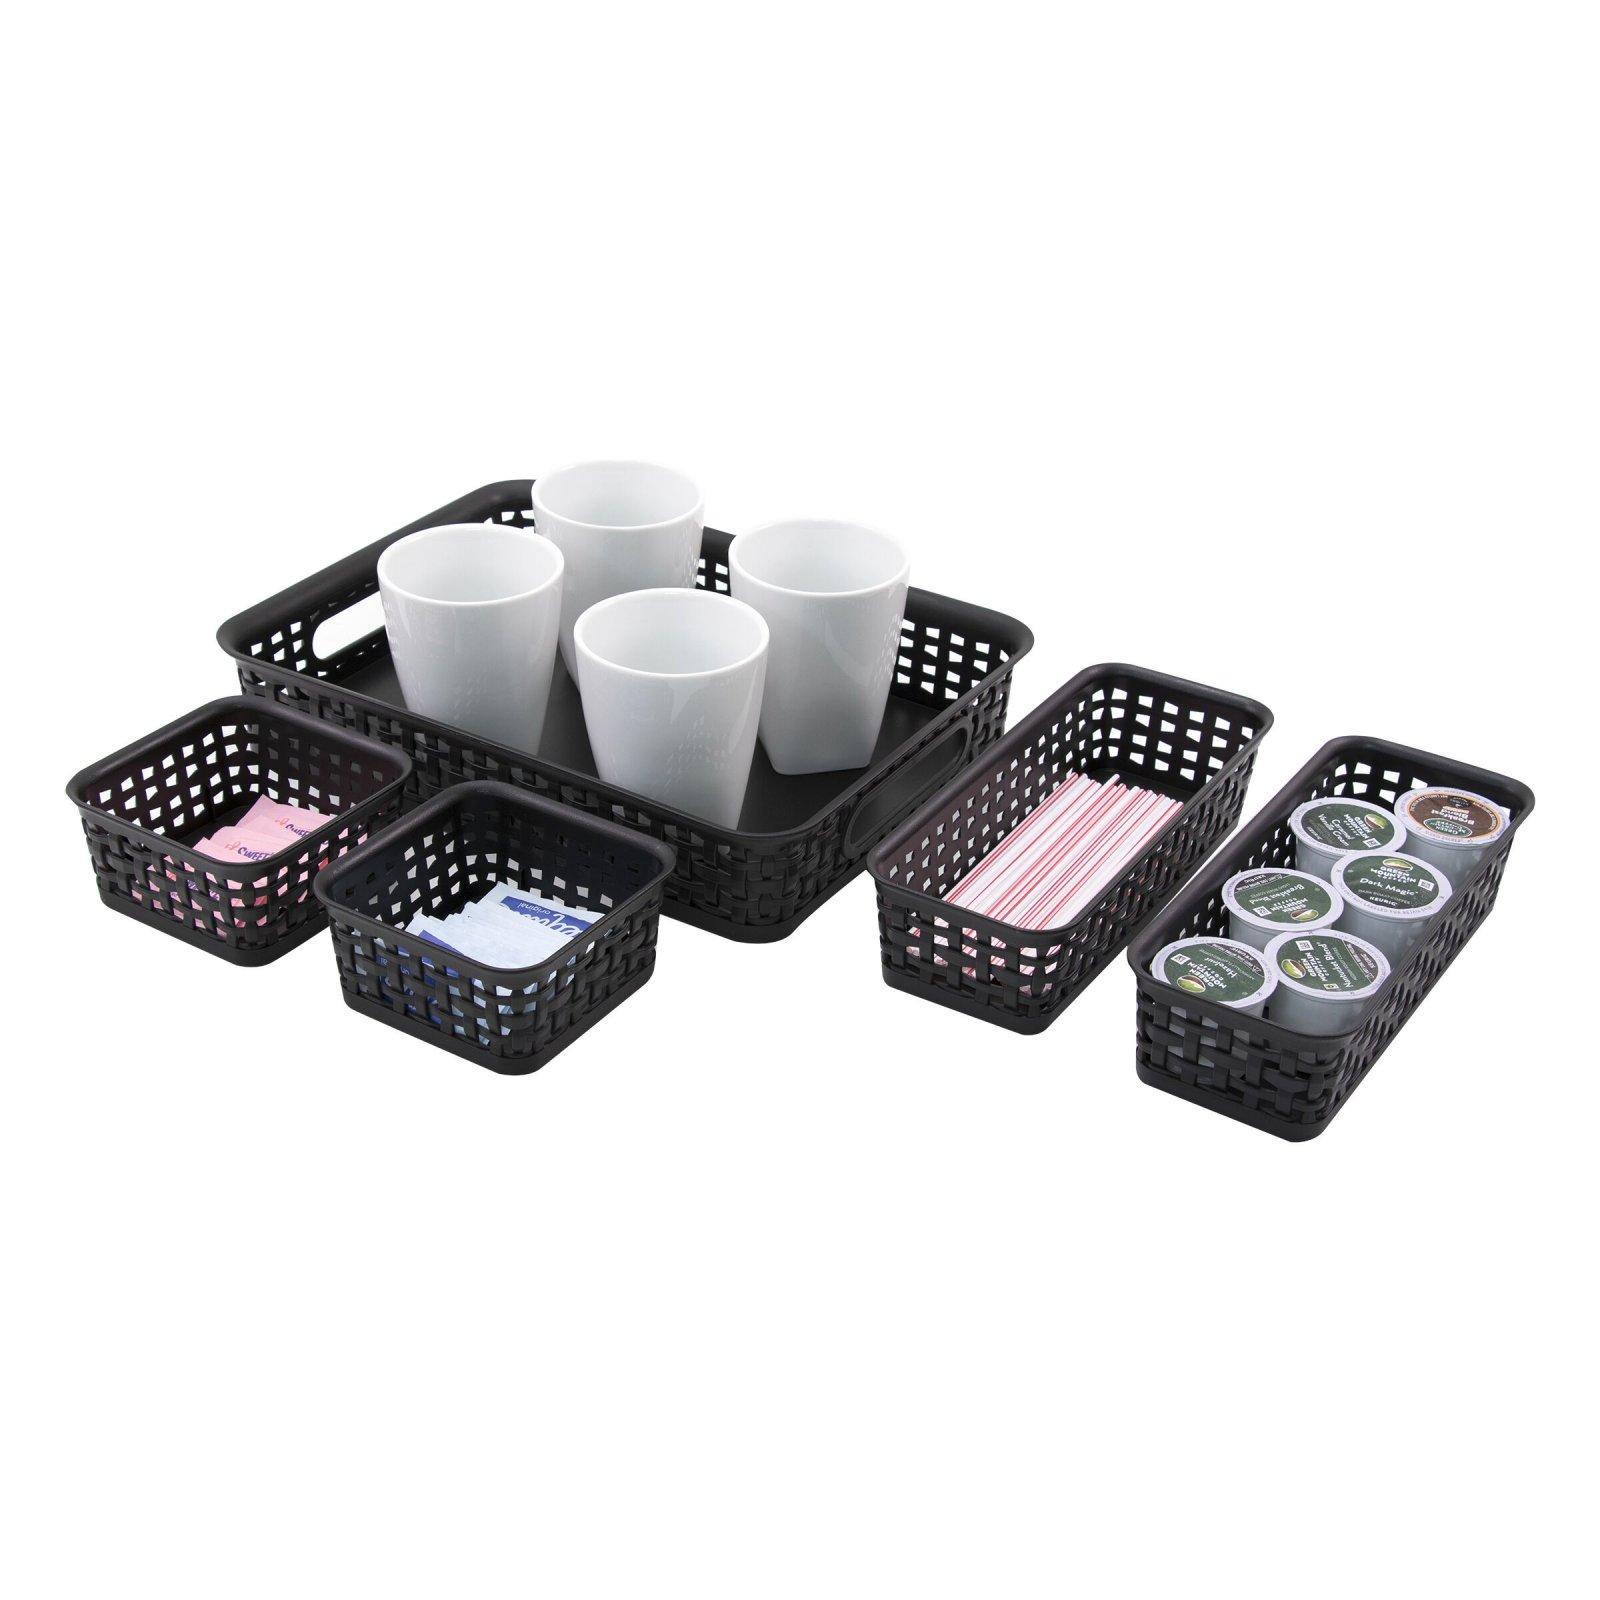 Storage Studios Black Plastic Weave Bins 5 pk